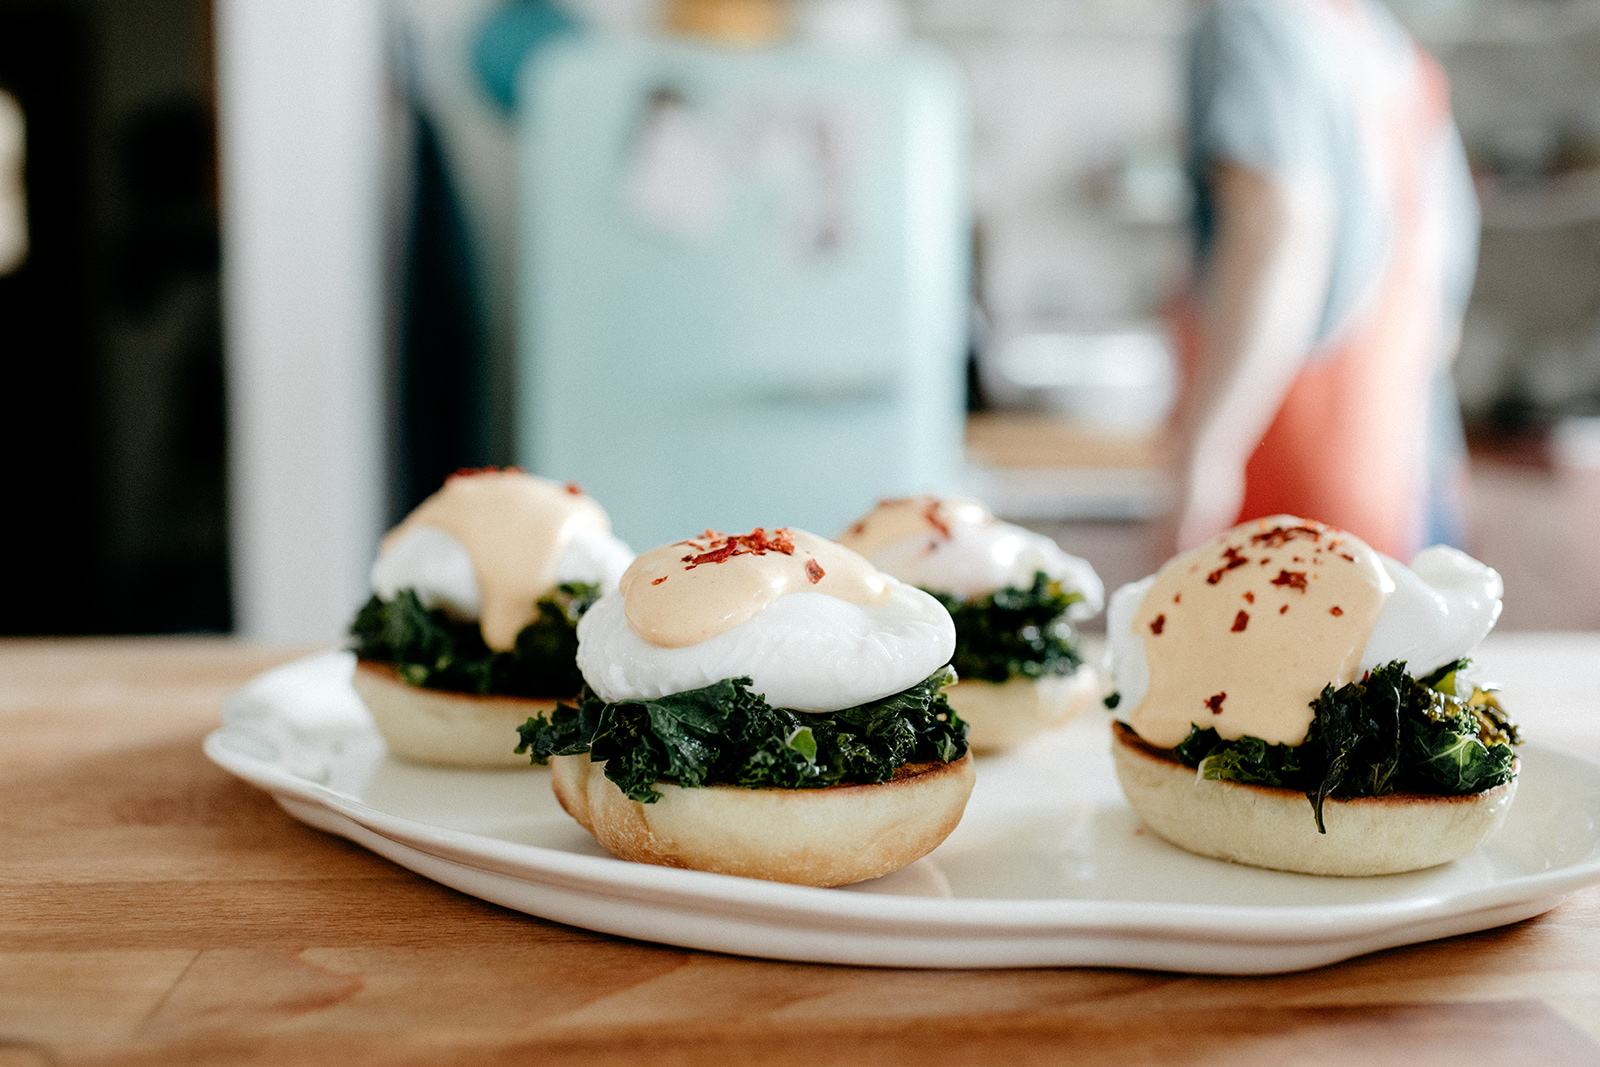 molly-yeh-pita-eggs-benedict-7.jpg